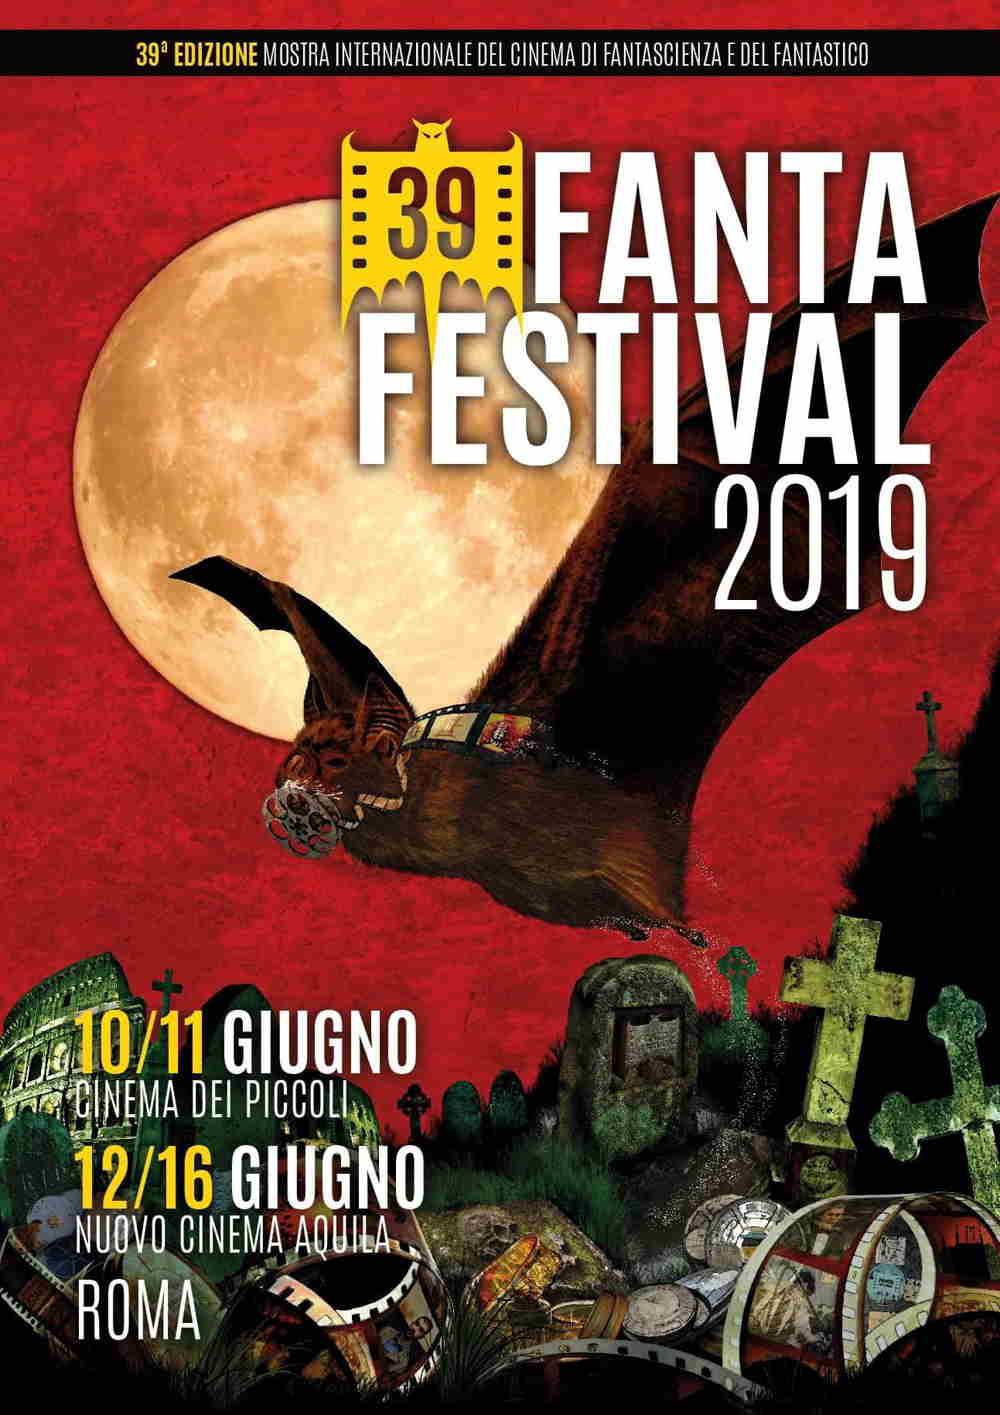 Fantafestival 2019